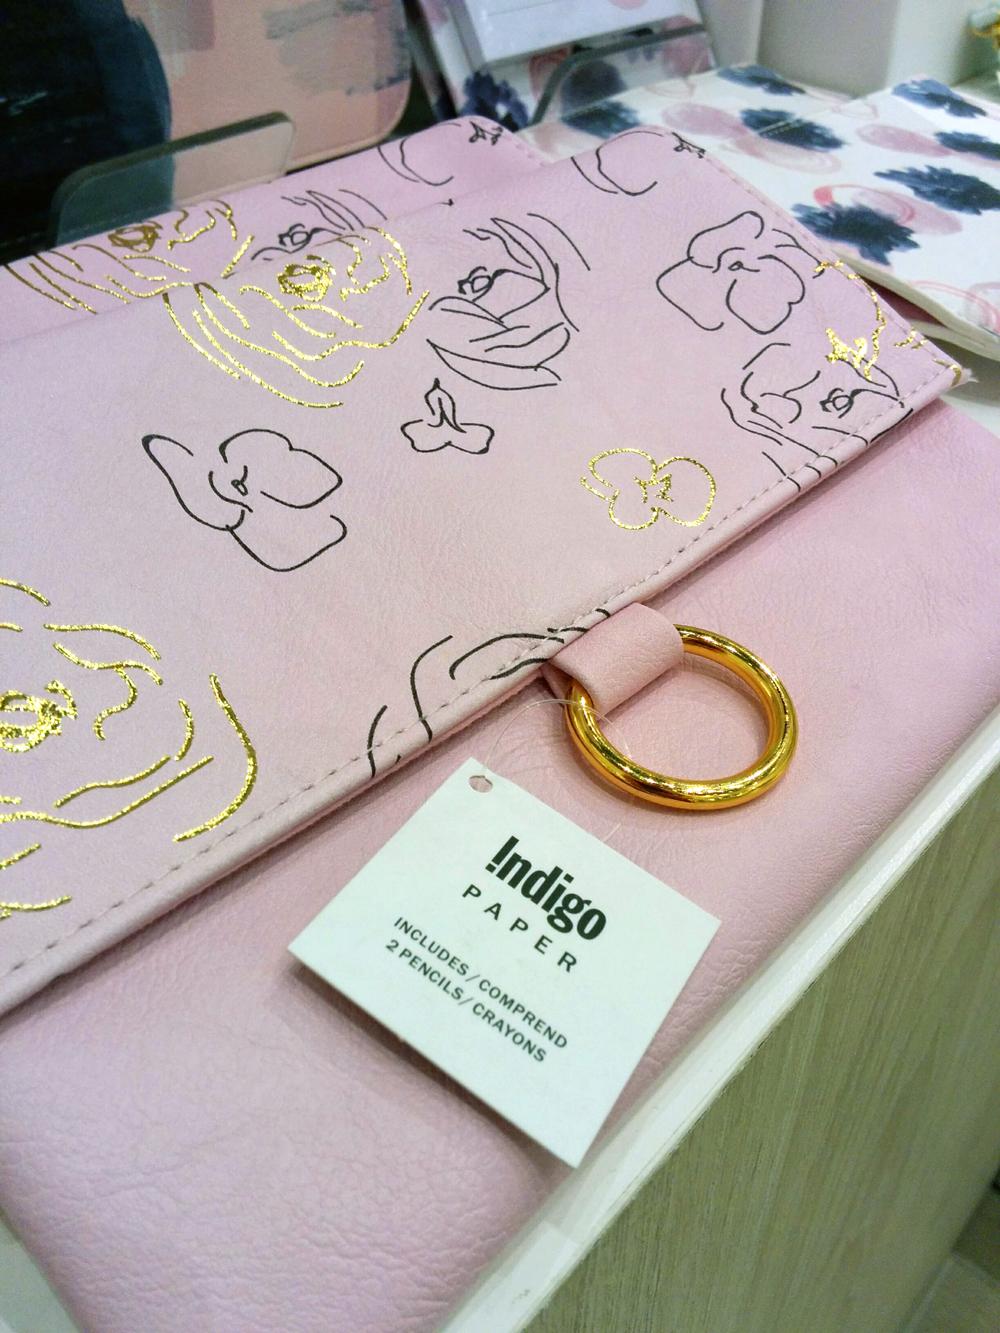 indigo-pink-floral-pattern-6.jpg